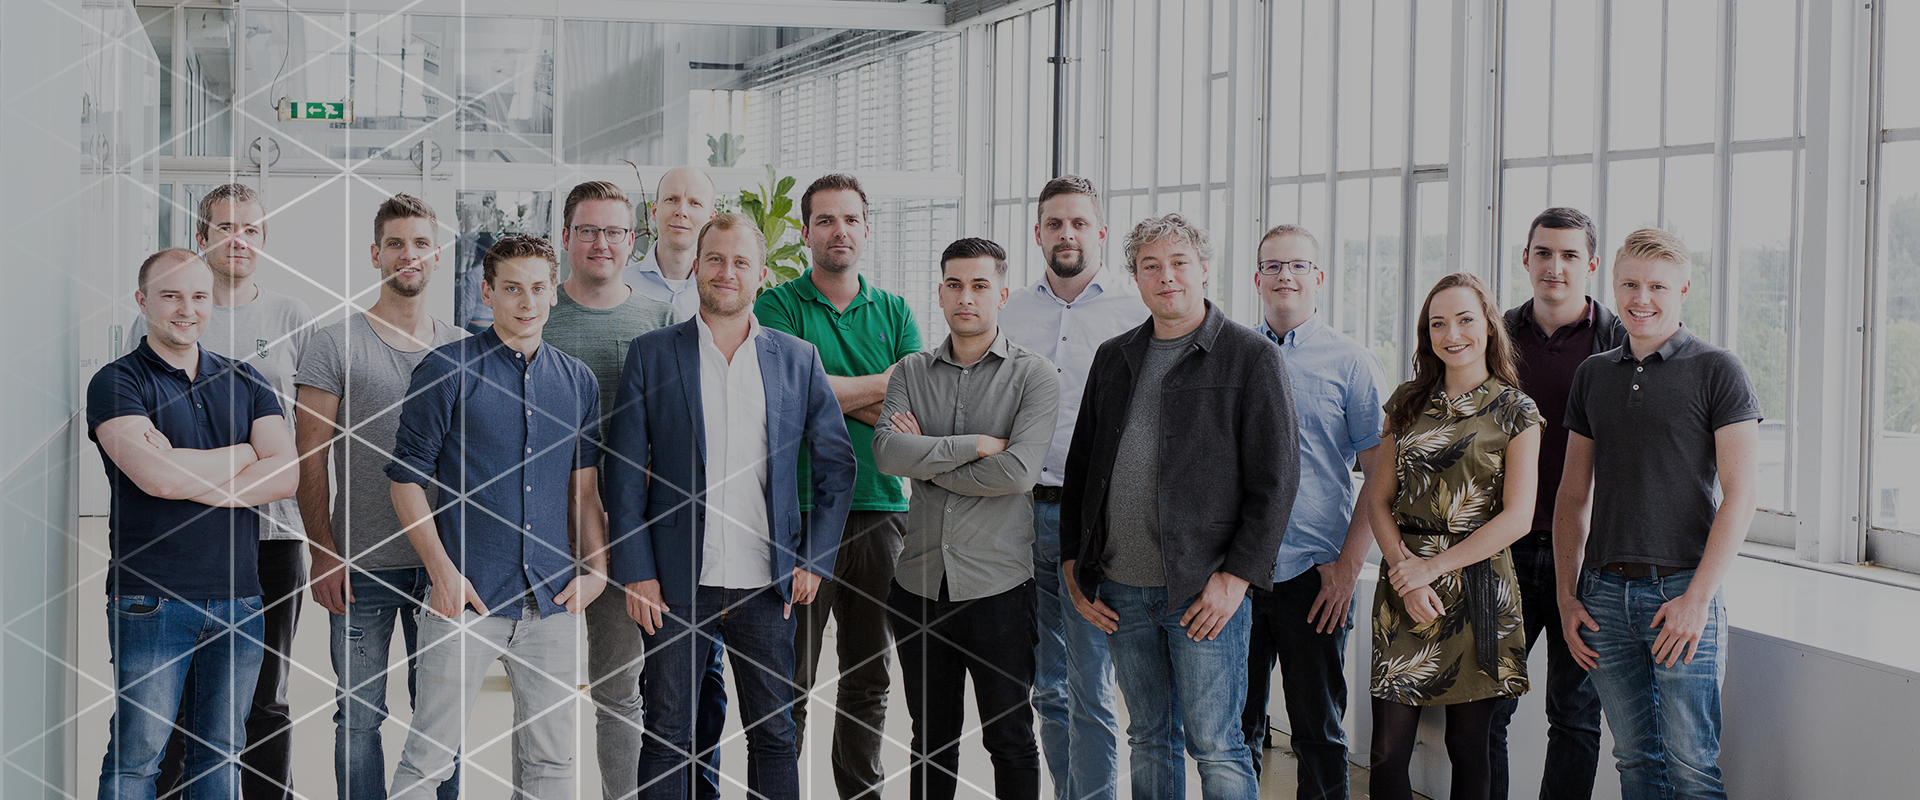 YachtCloud technology for luxury team photo Rotterdam